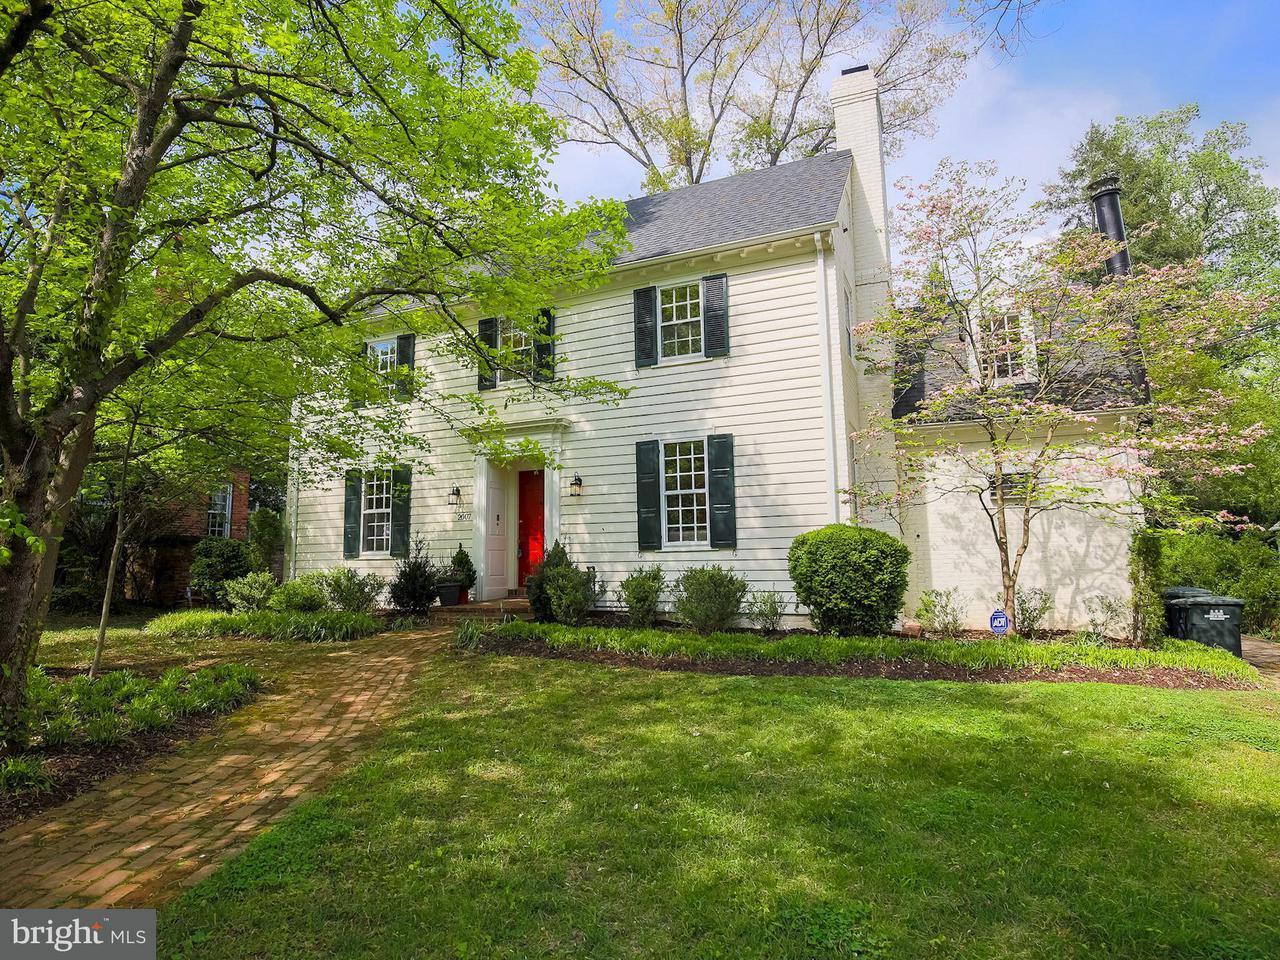 獨棟家庭住宅 為 出售 在 2007 Plymouth St Nw 2007 Plymouth St Nw Washington, 哥倫比亞特區 20012 美國